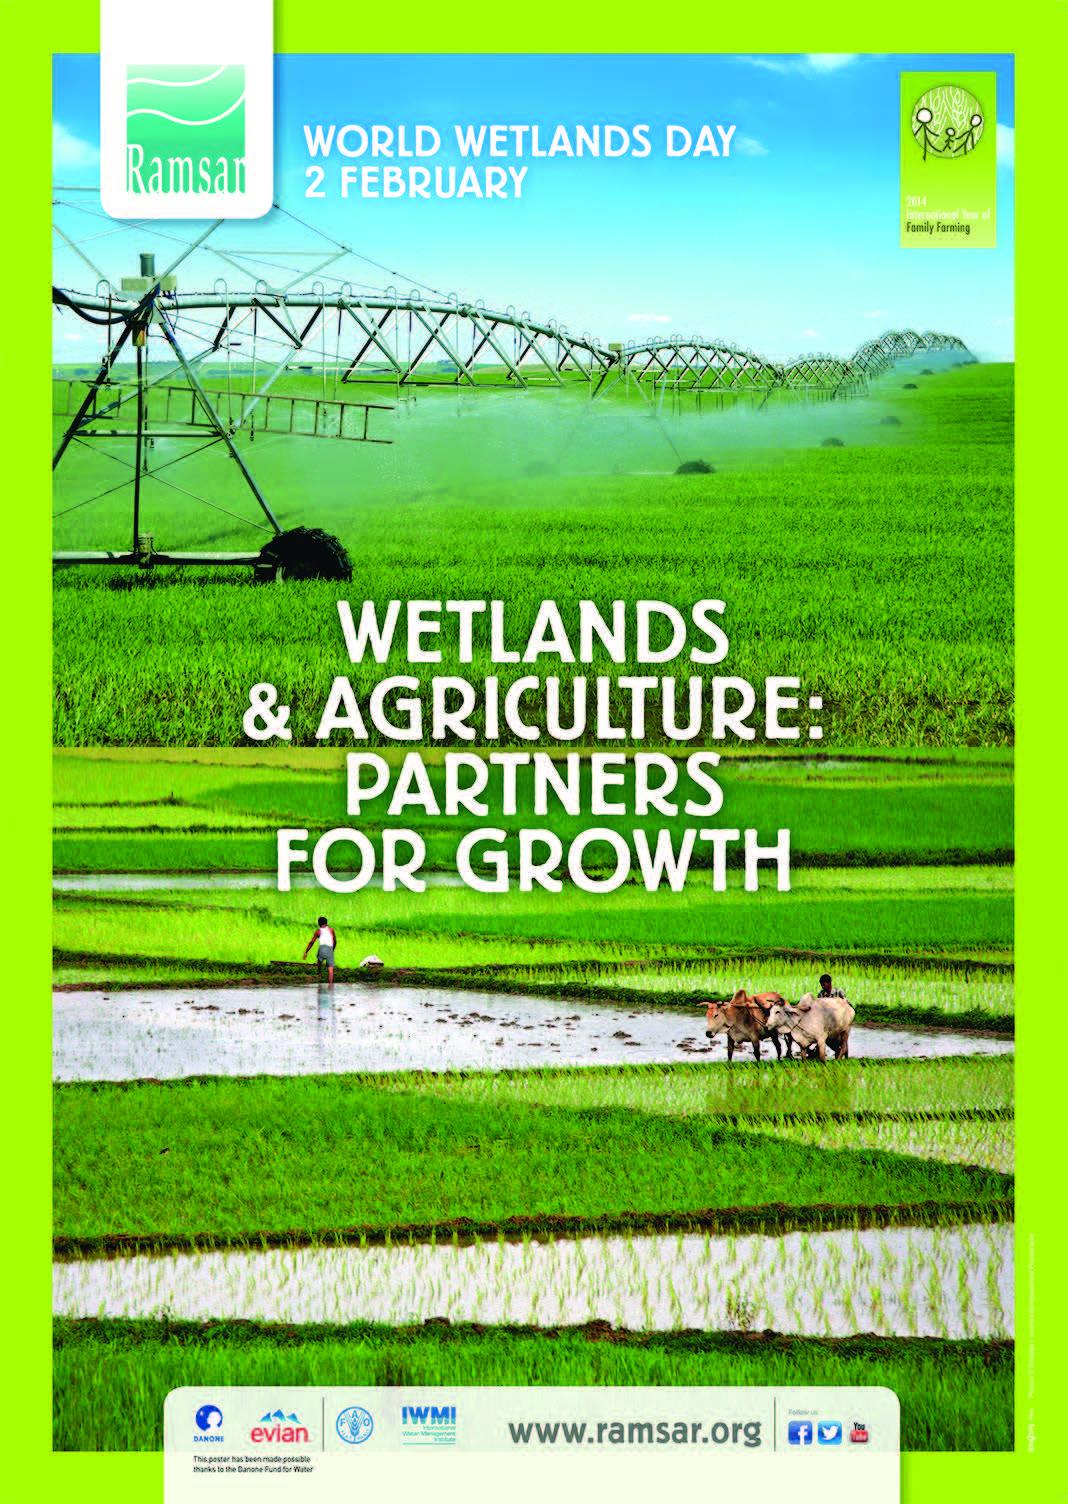 World Wetlands Day 2014 poster © Ramsar